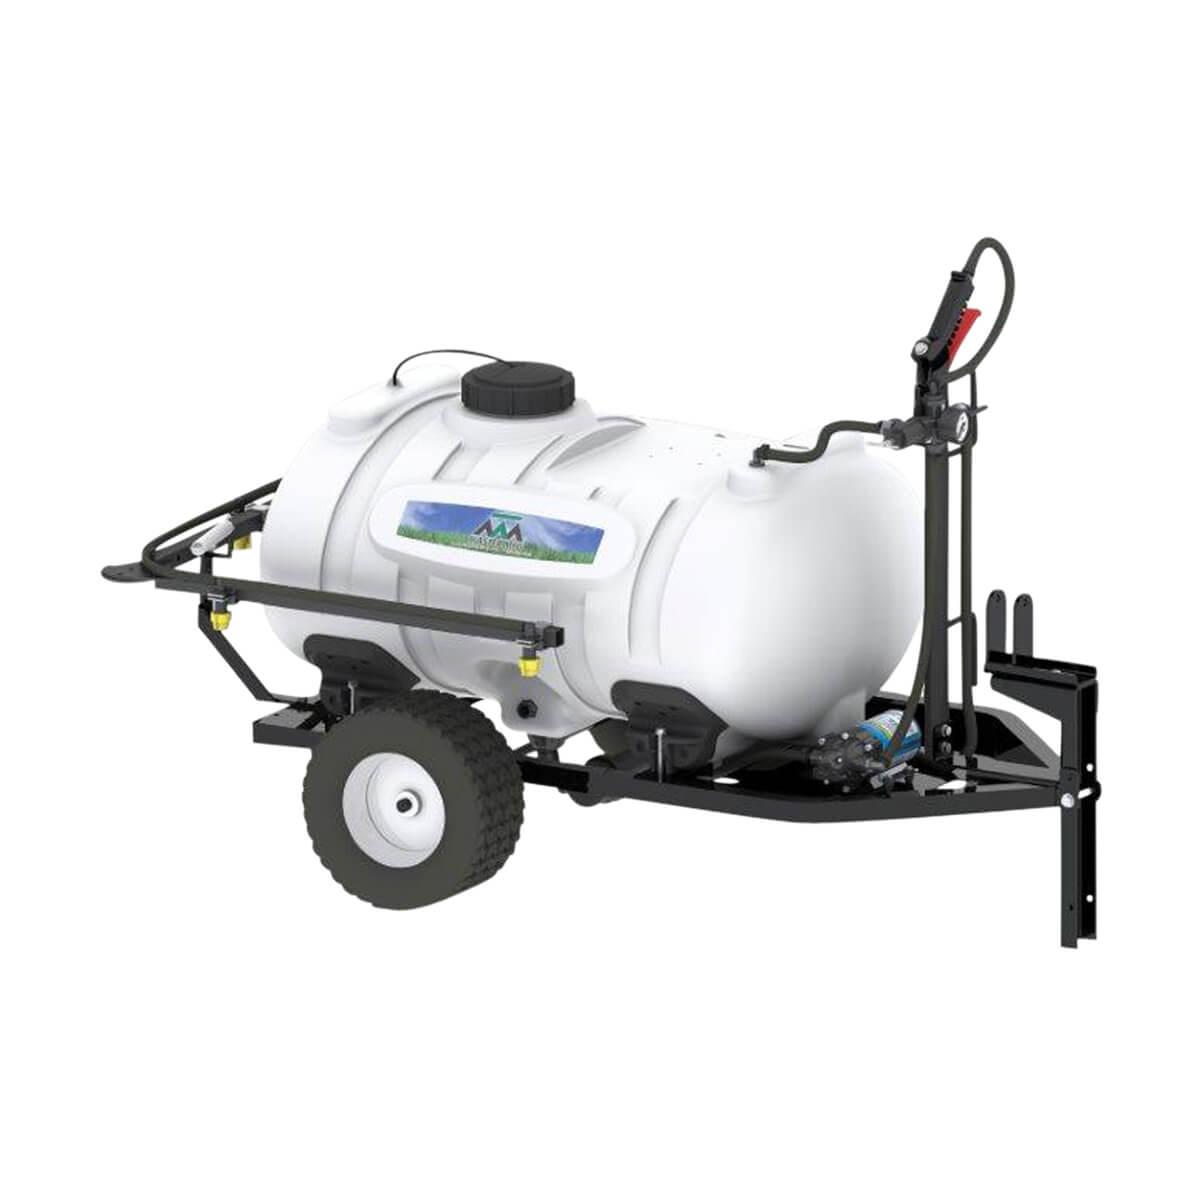 40 Gallon Lawn Sprayer